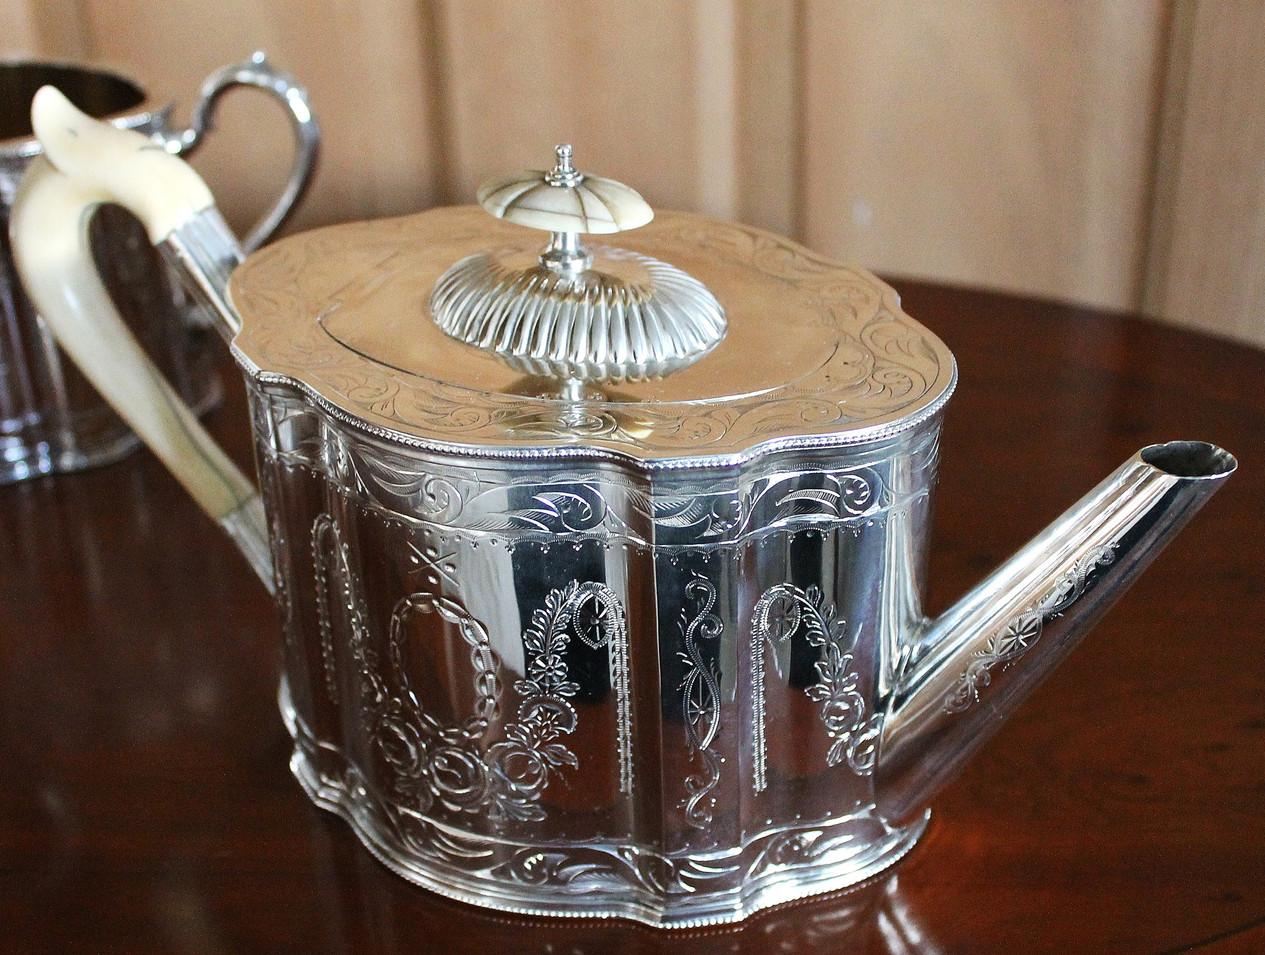 silver111 331 (2).jpg